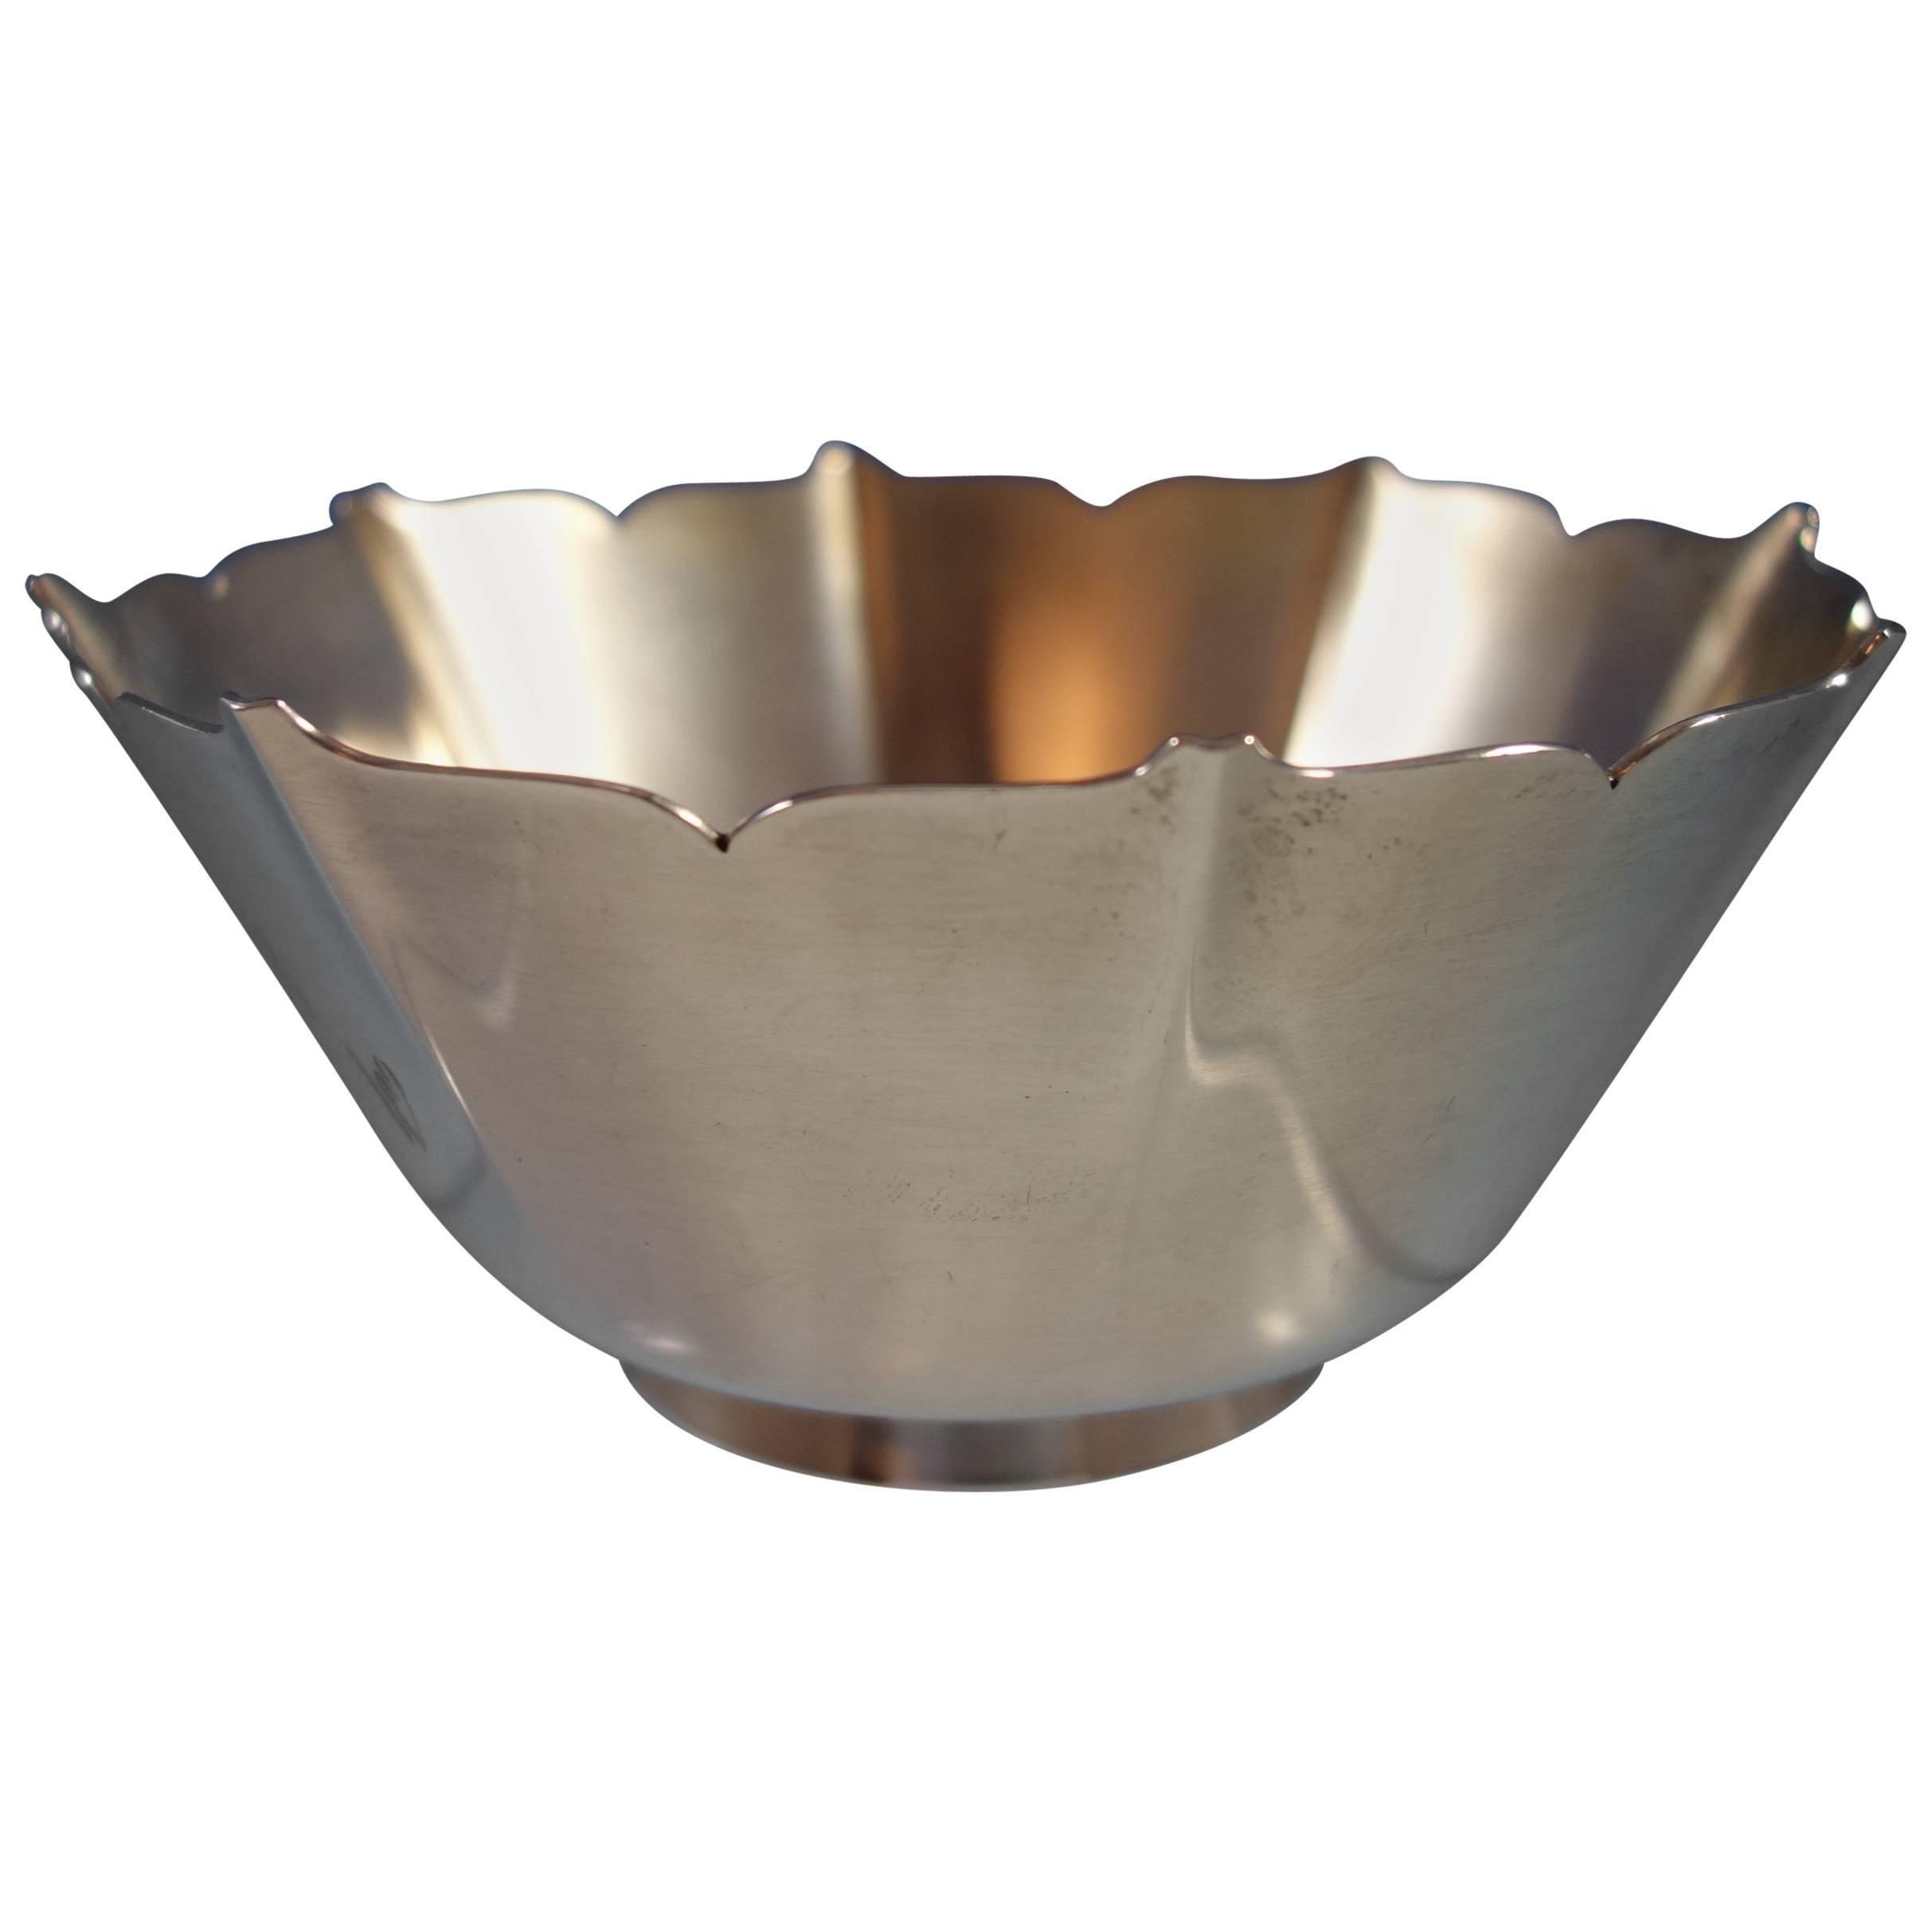 Esprit by Gorham Sterling Silver Bowl #1429 Hollowware SKU #2014